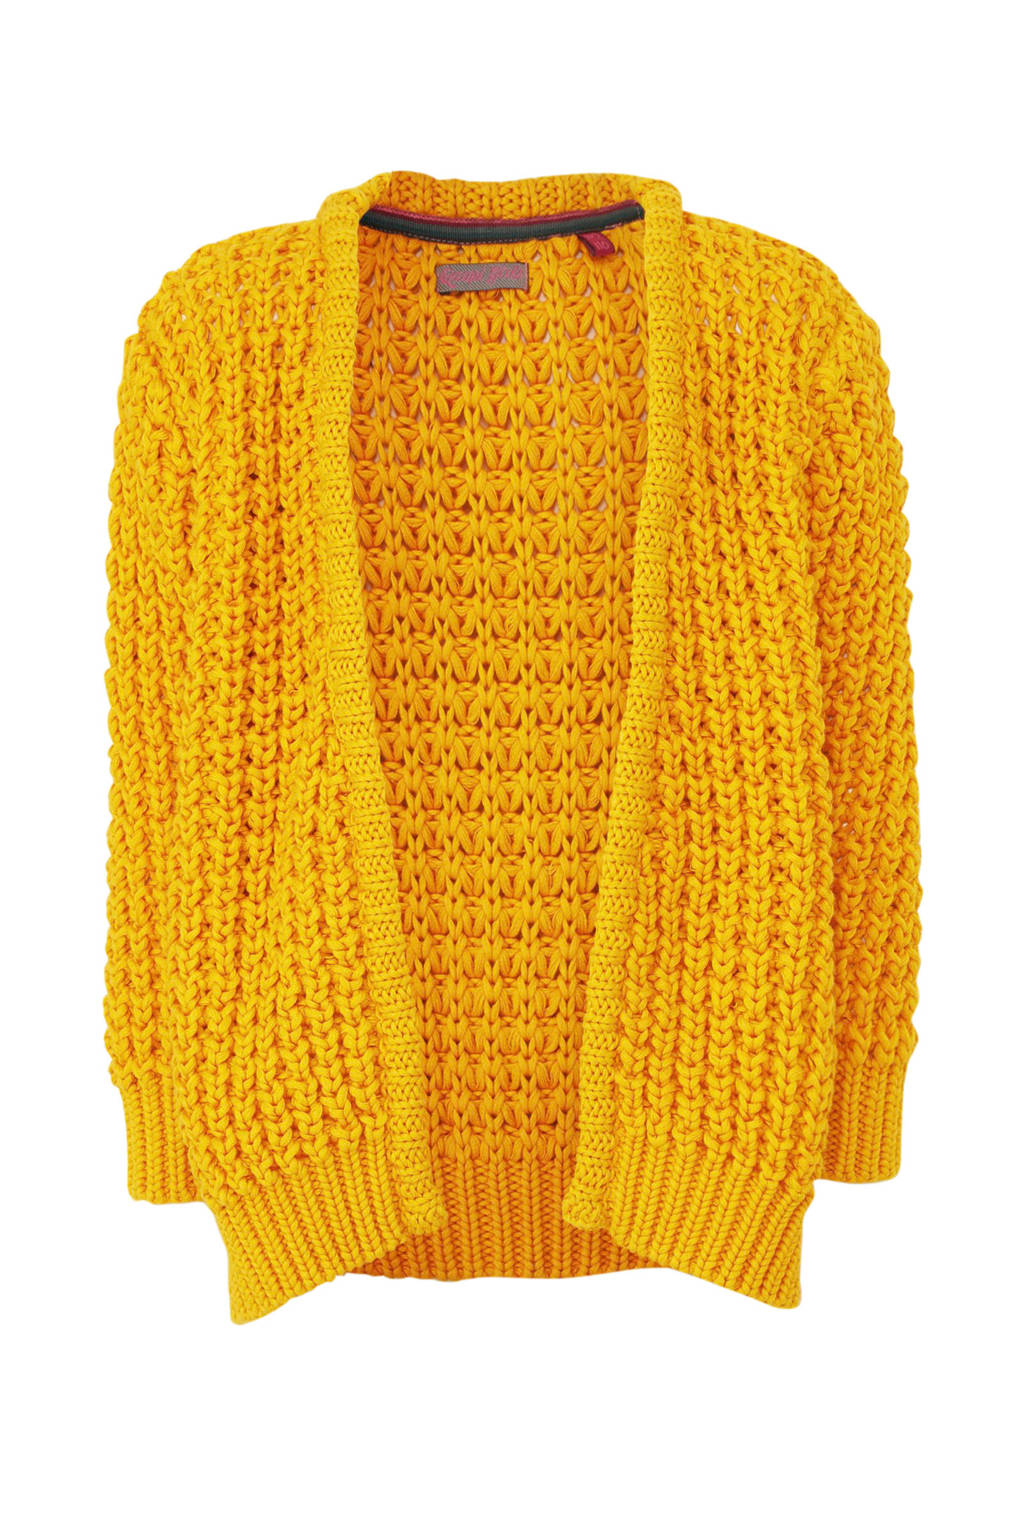 https://myshop.s3-external-3.amazonaws.com/shop3044400.pictures.quapi-tifa-amber-yellow.jpg